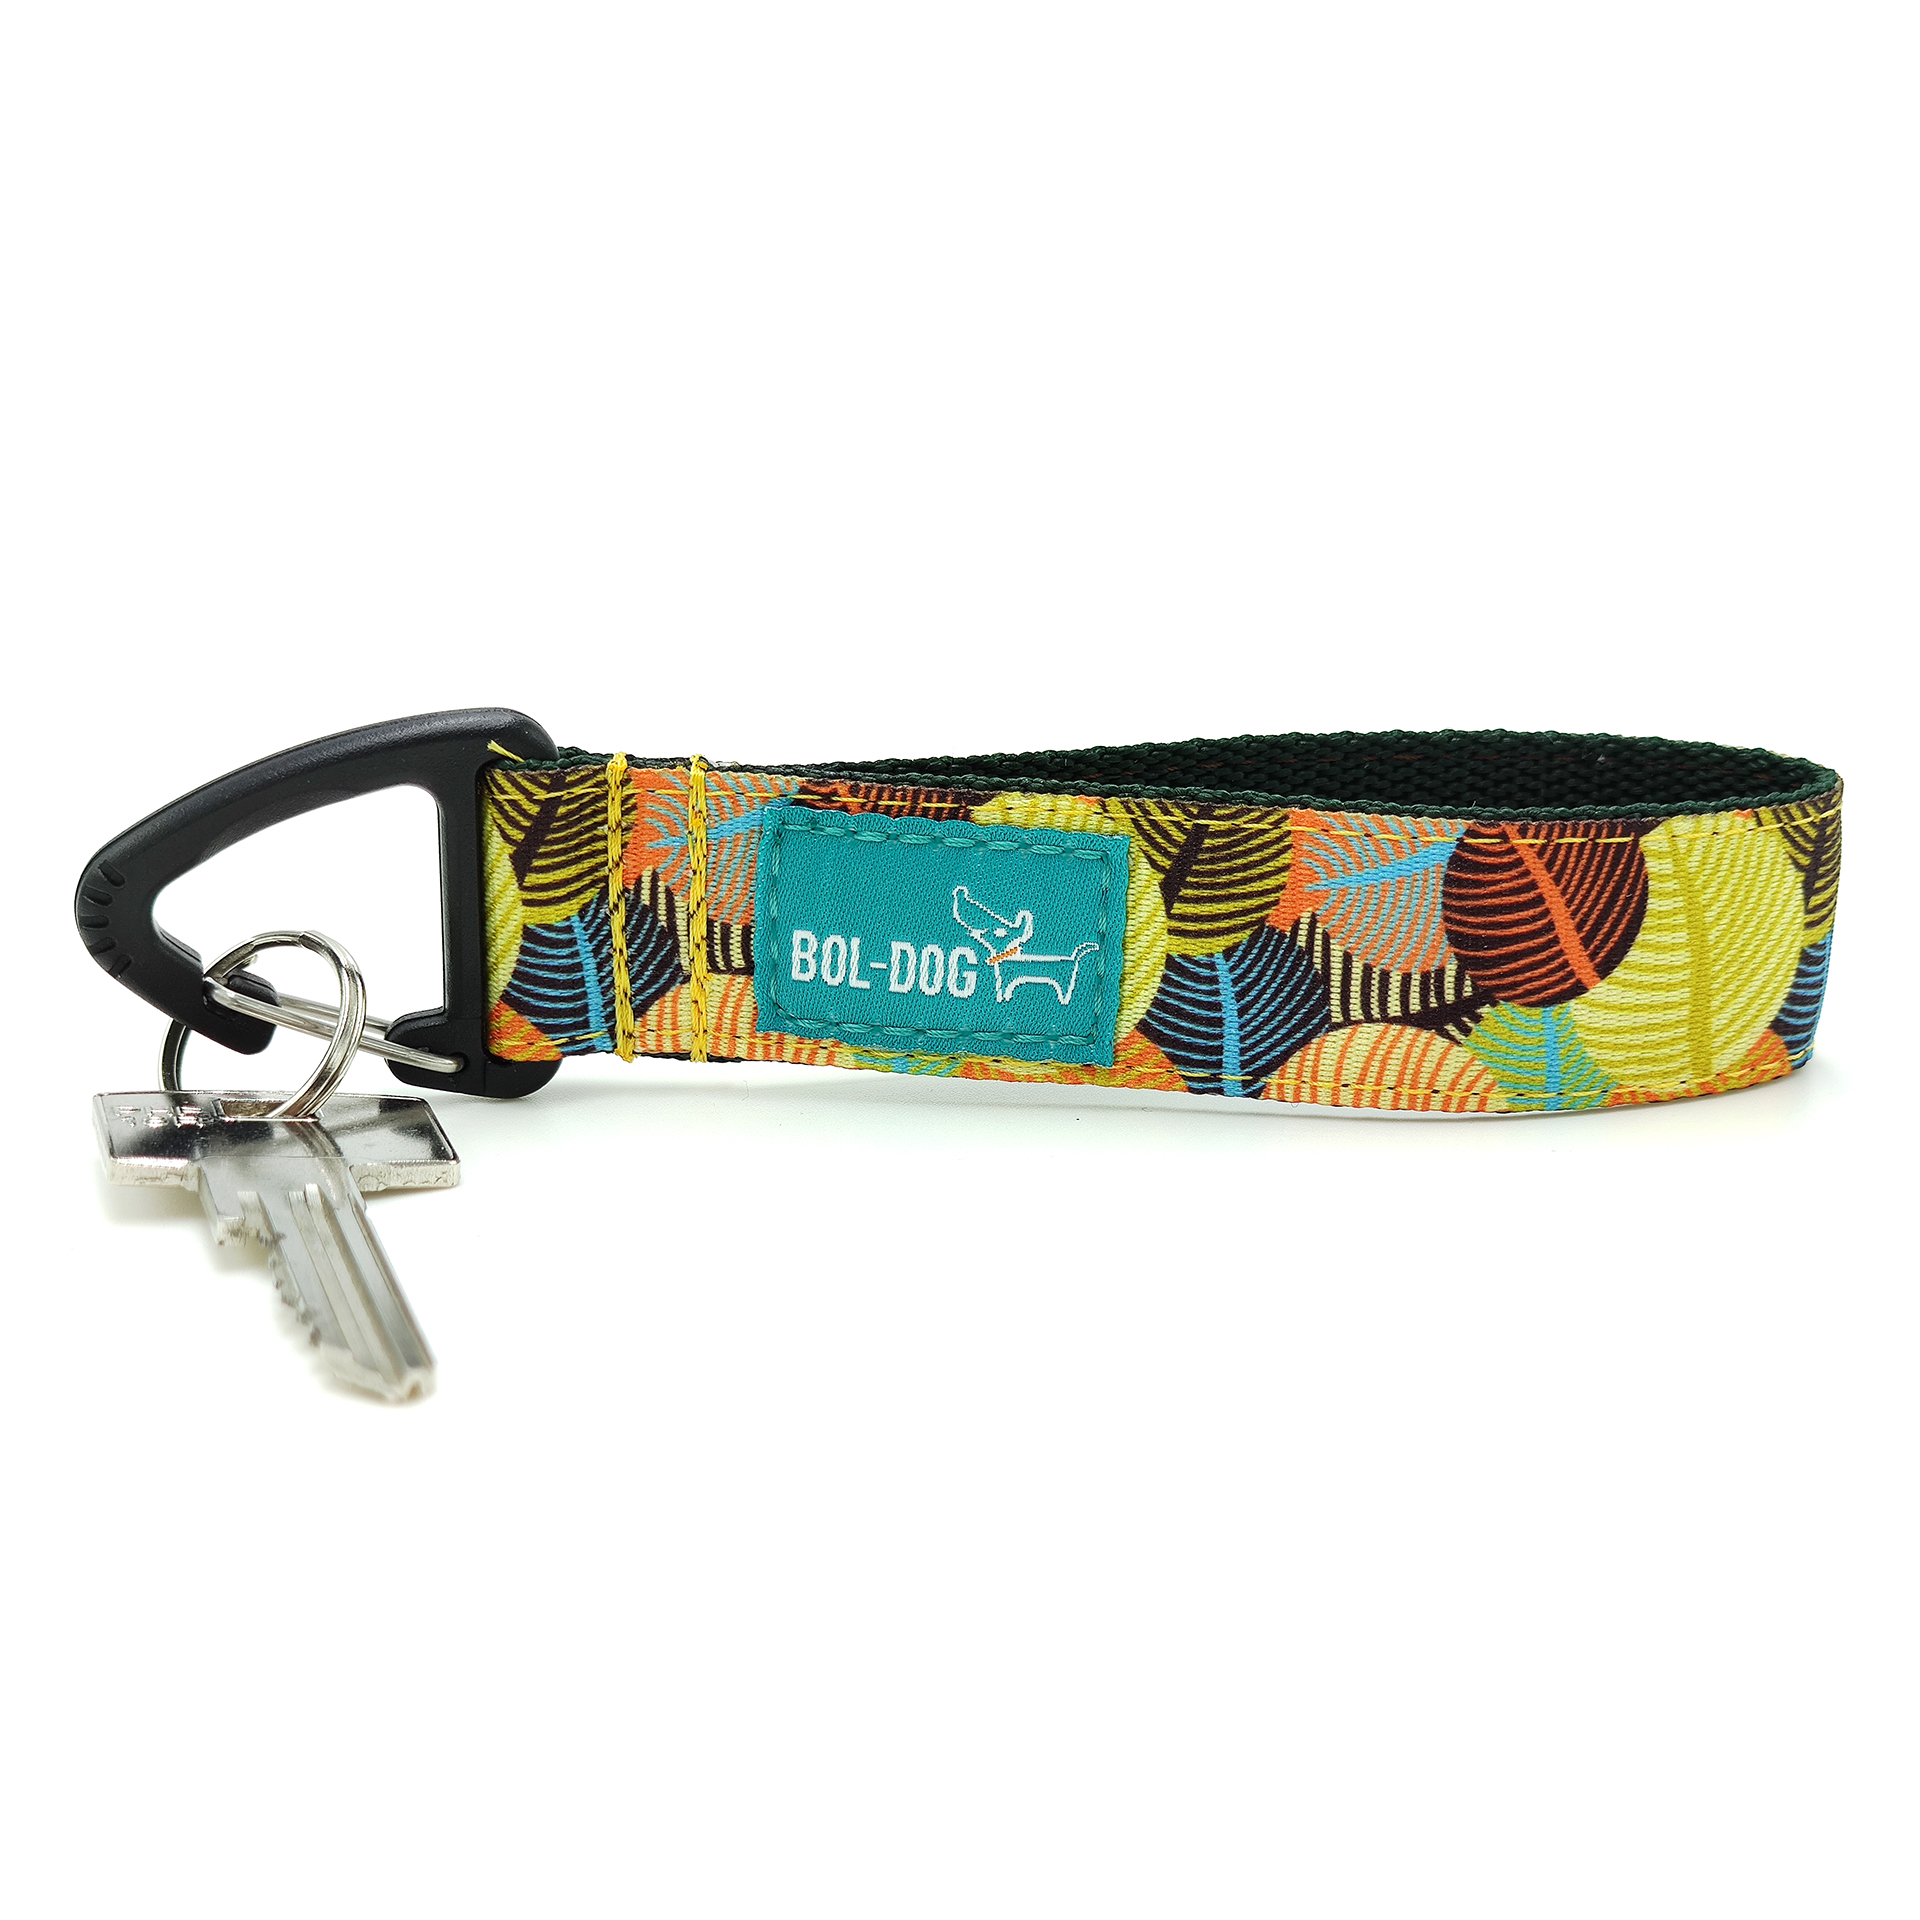 Palm key holder